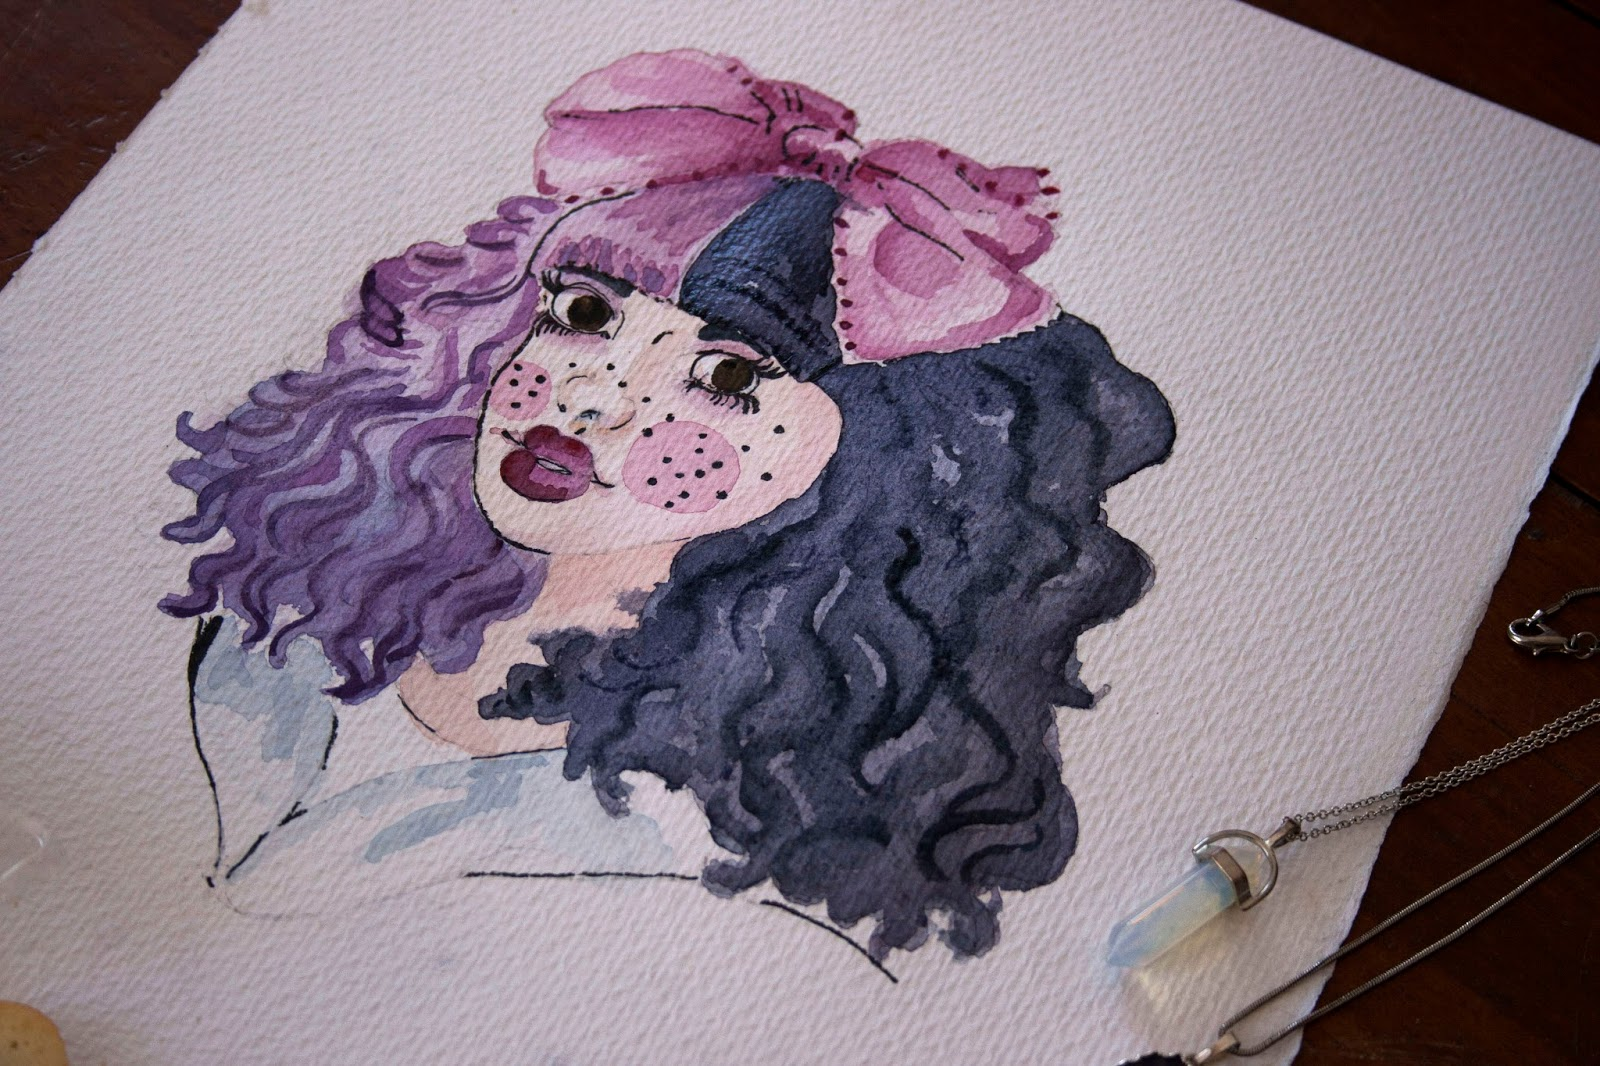 Ilustracion-acuarela-melanie-martinez-dollhouse